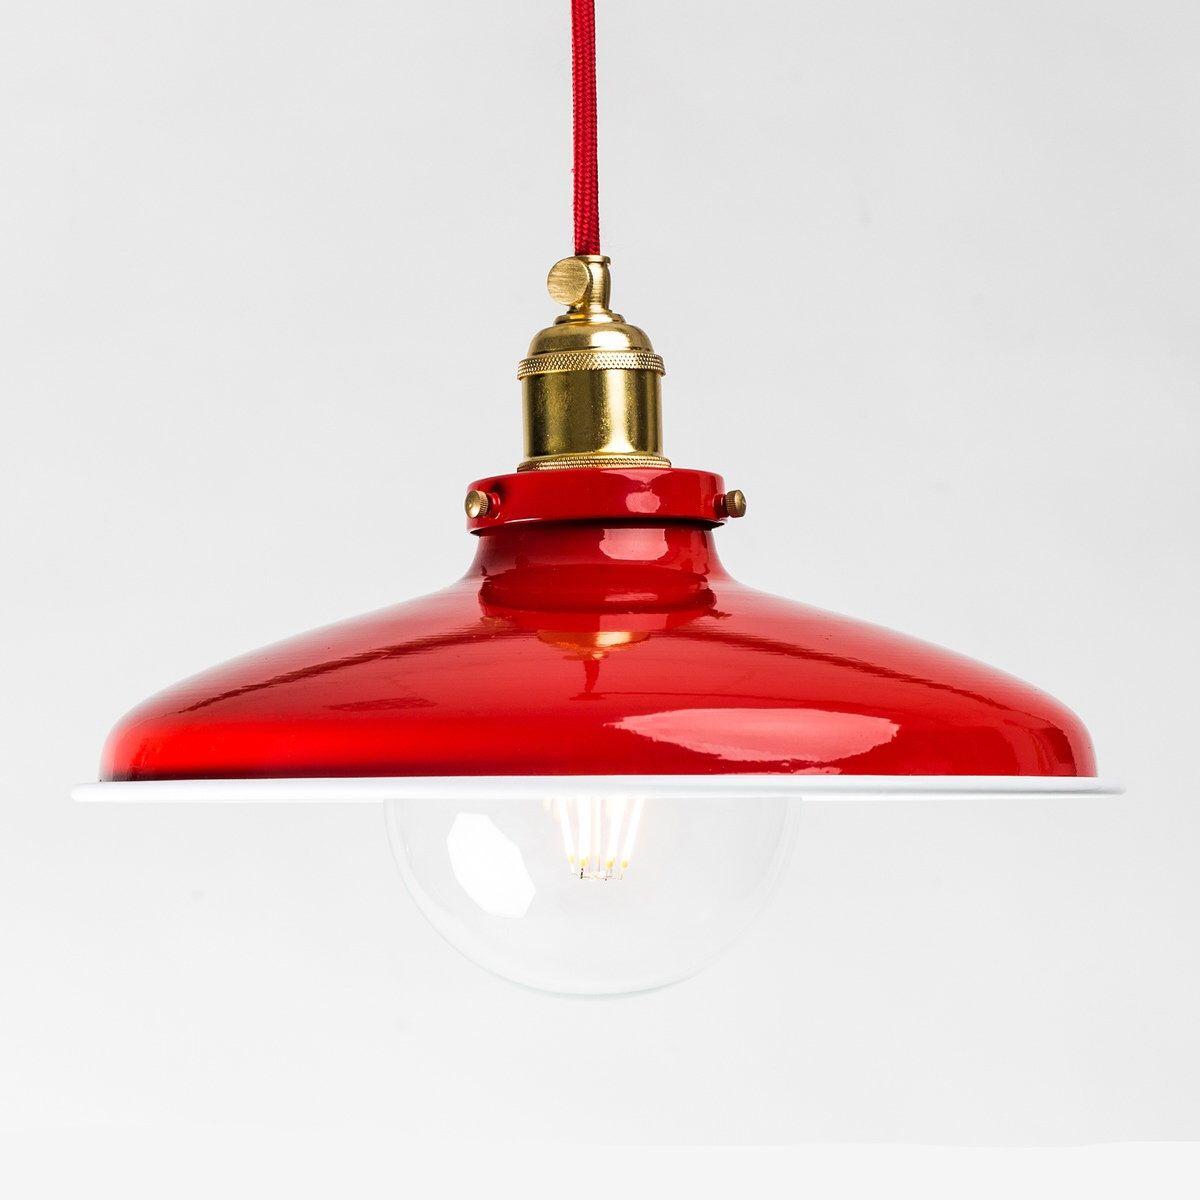 Red Pendant Light Kitchen Island Pendant Lighting Dine Room Etsy Red Pendant Light Red Kitchen Pendant Lights Pendant Light